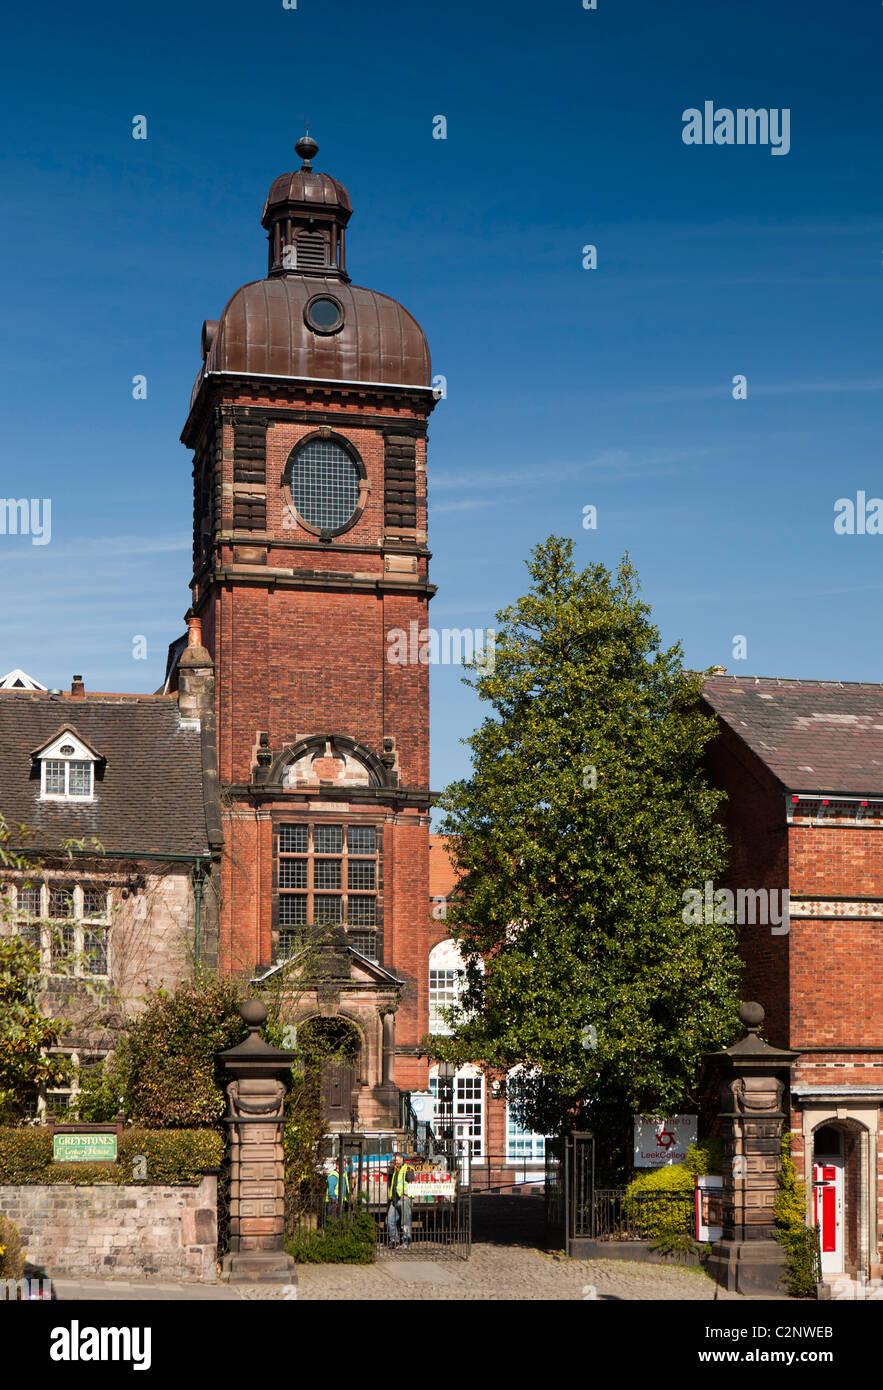 UK, England, Staffordshire, Leek, Stockwell Street, Nicholson Institute - Stock Image